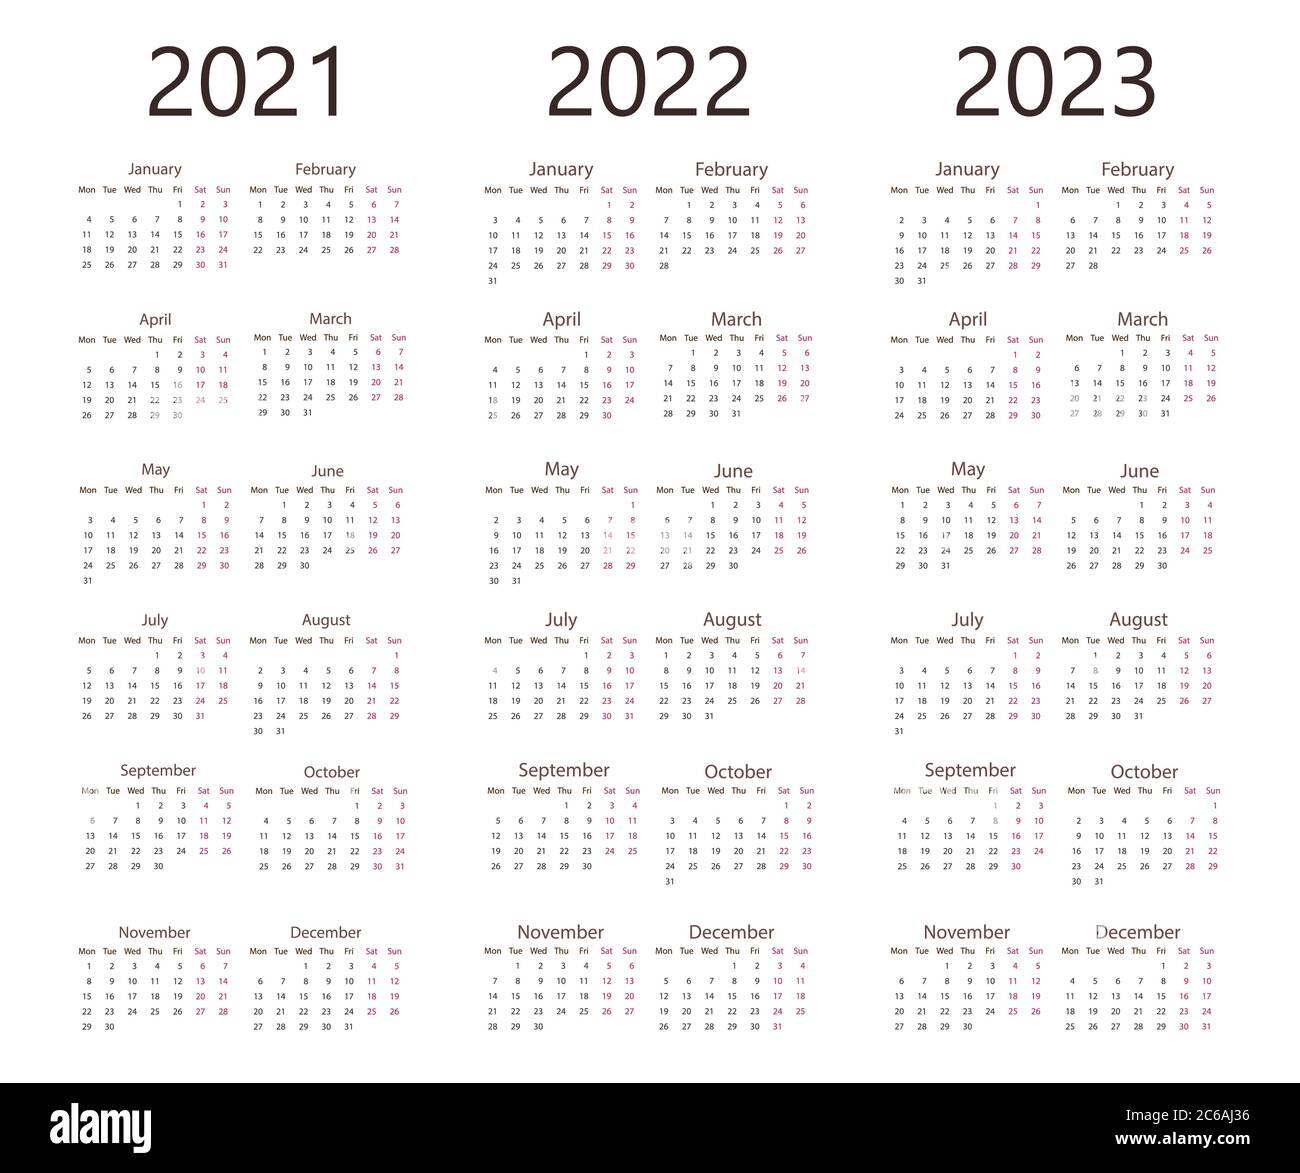 Calendrier Semaine 2022 2023 Calendrier 2021, 2022, 2023, semaine lundi. Illustration